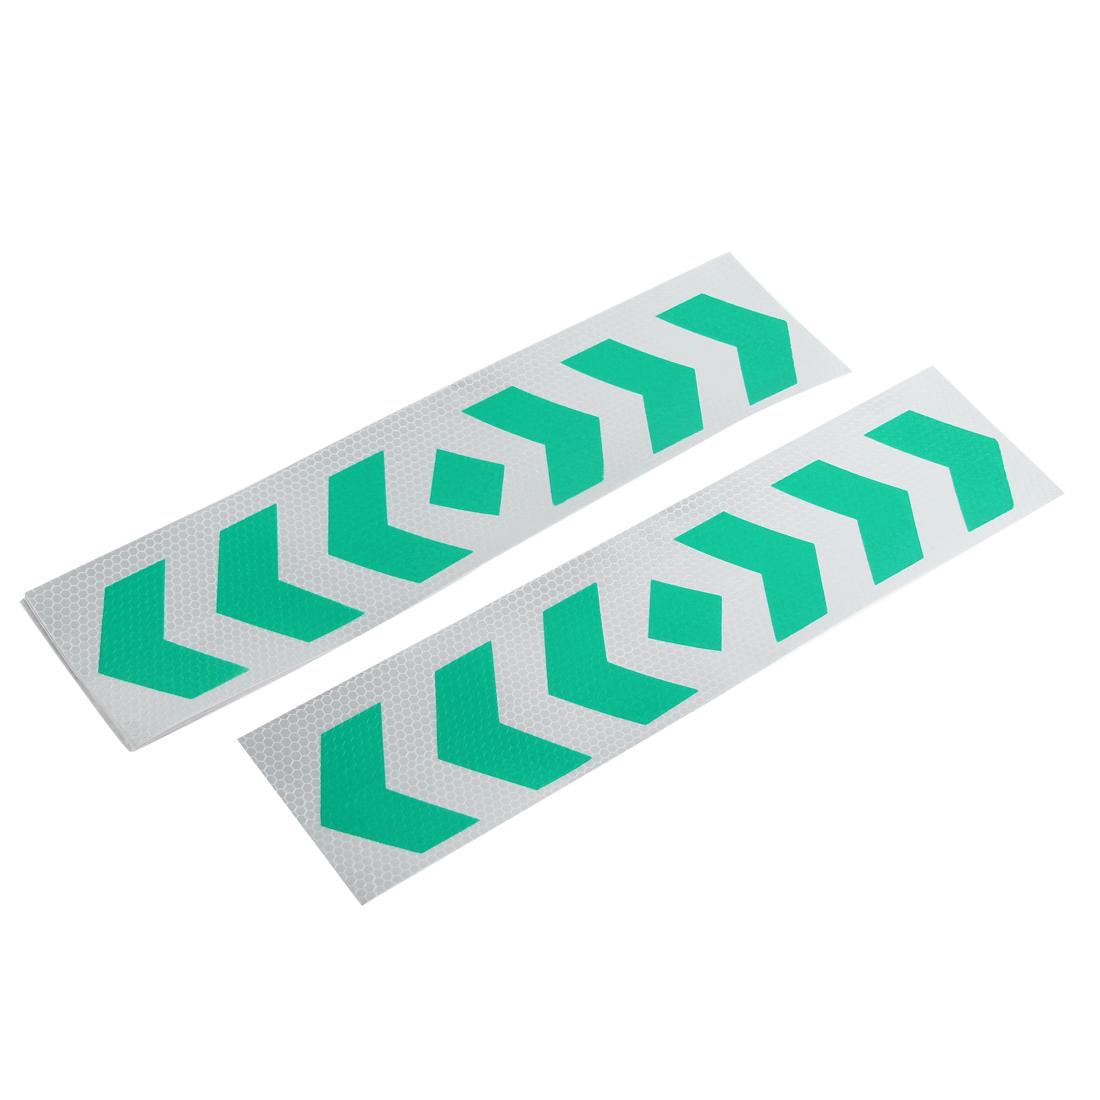 10 Pcs Car Green Sliver Tone Arrows Print Reflected Stickers 40cm x 10cm